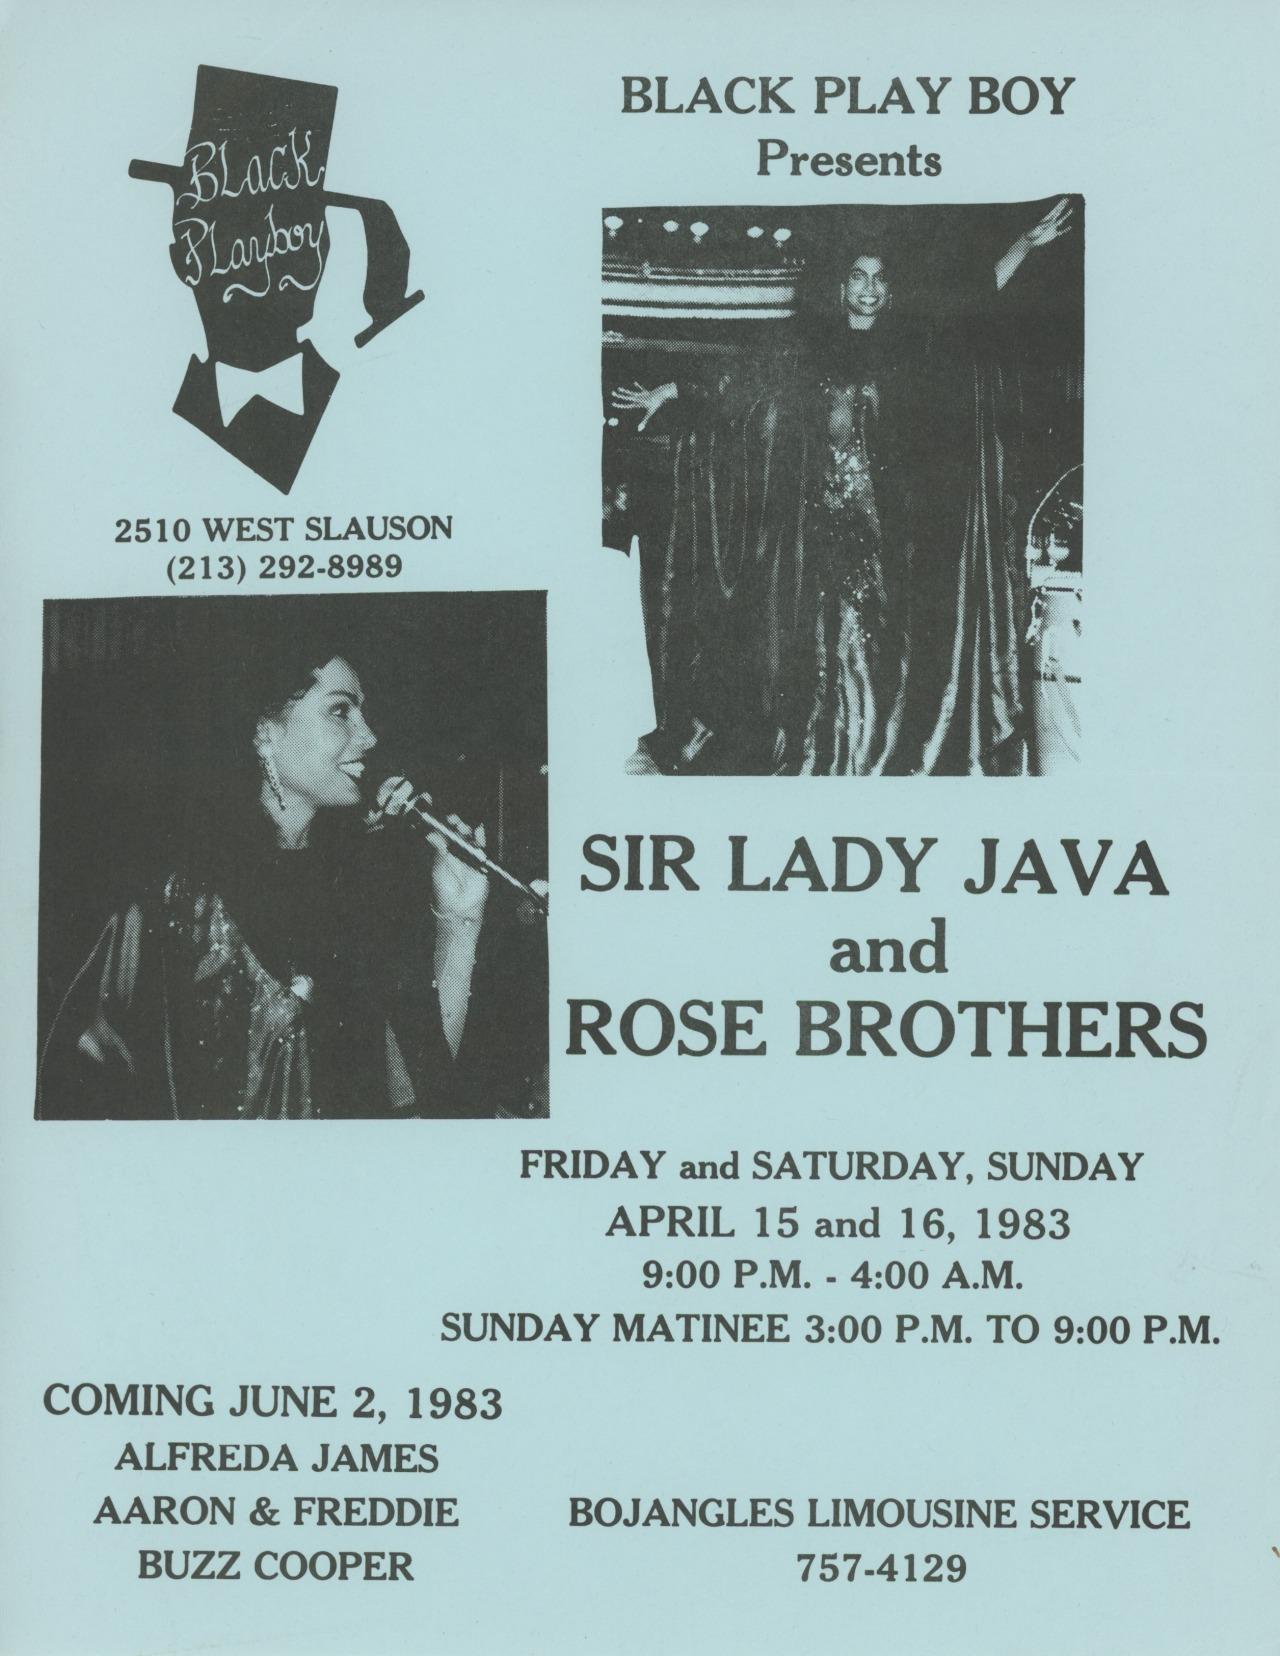 Sir Lady Java at the Black Playboy Club, April 15, 1983.